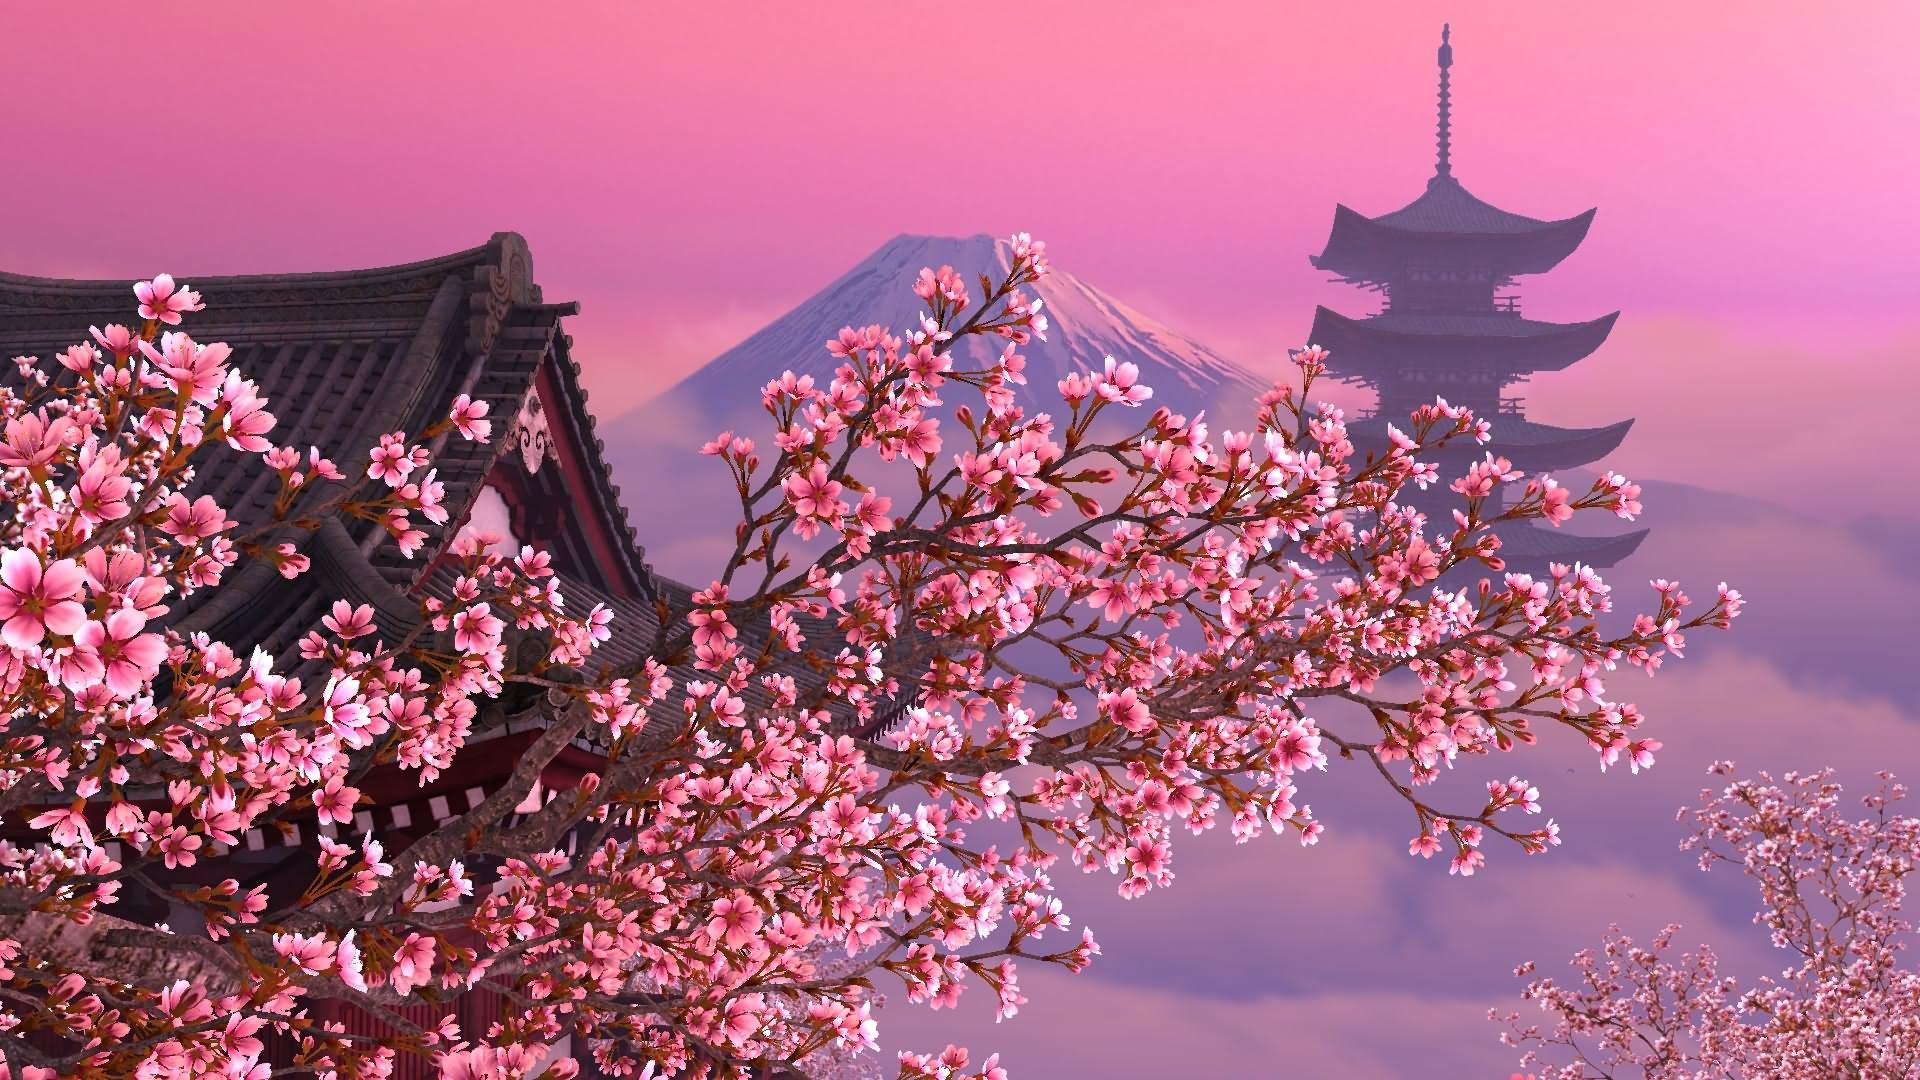 Blooming Sakura D Screensaver on 3d Card For Pc